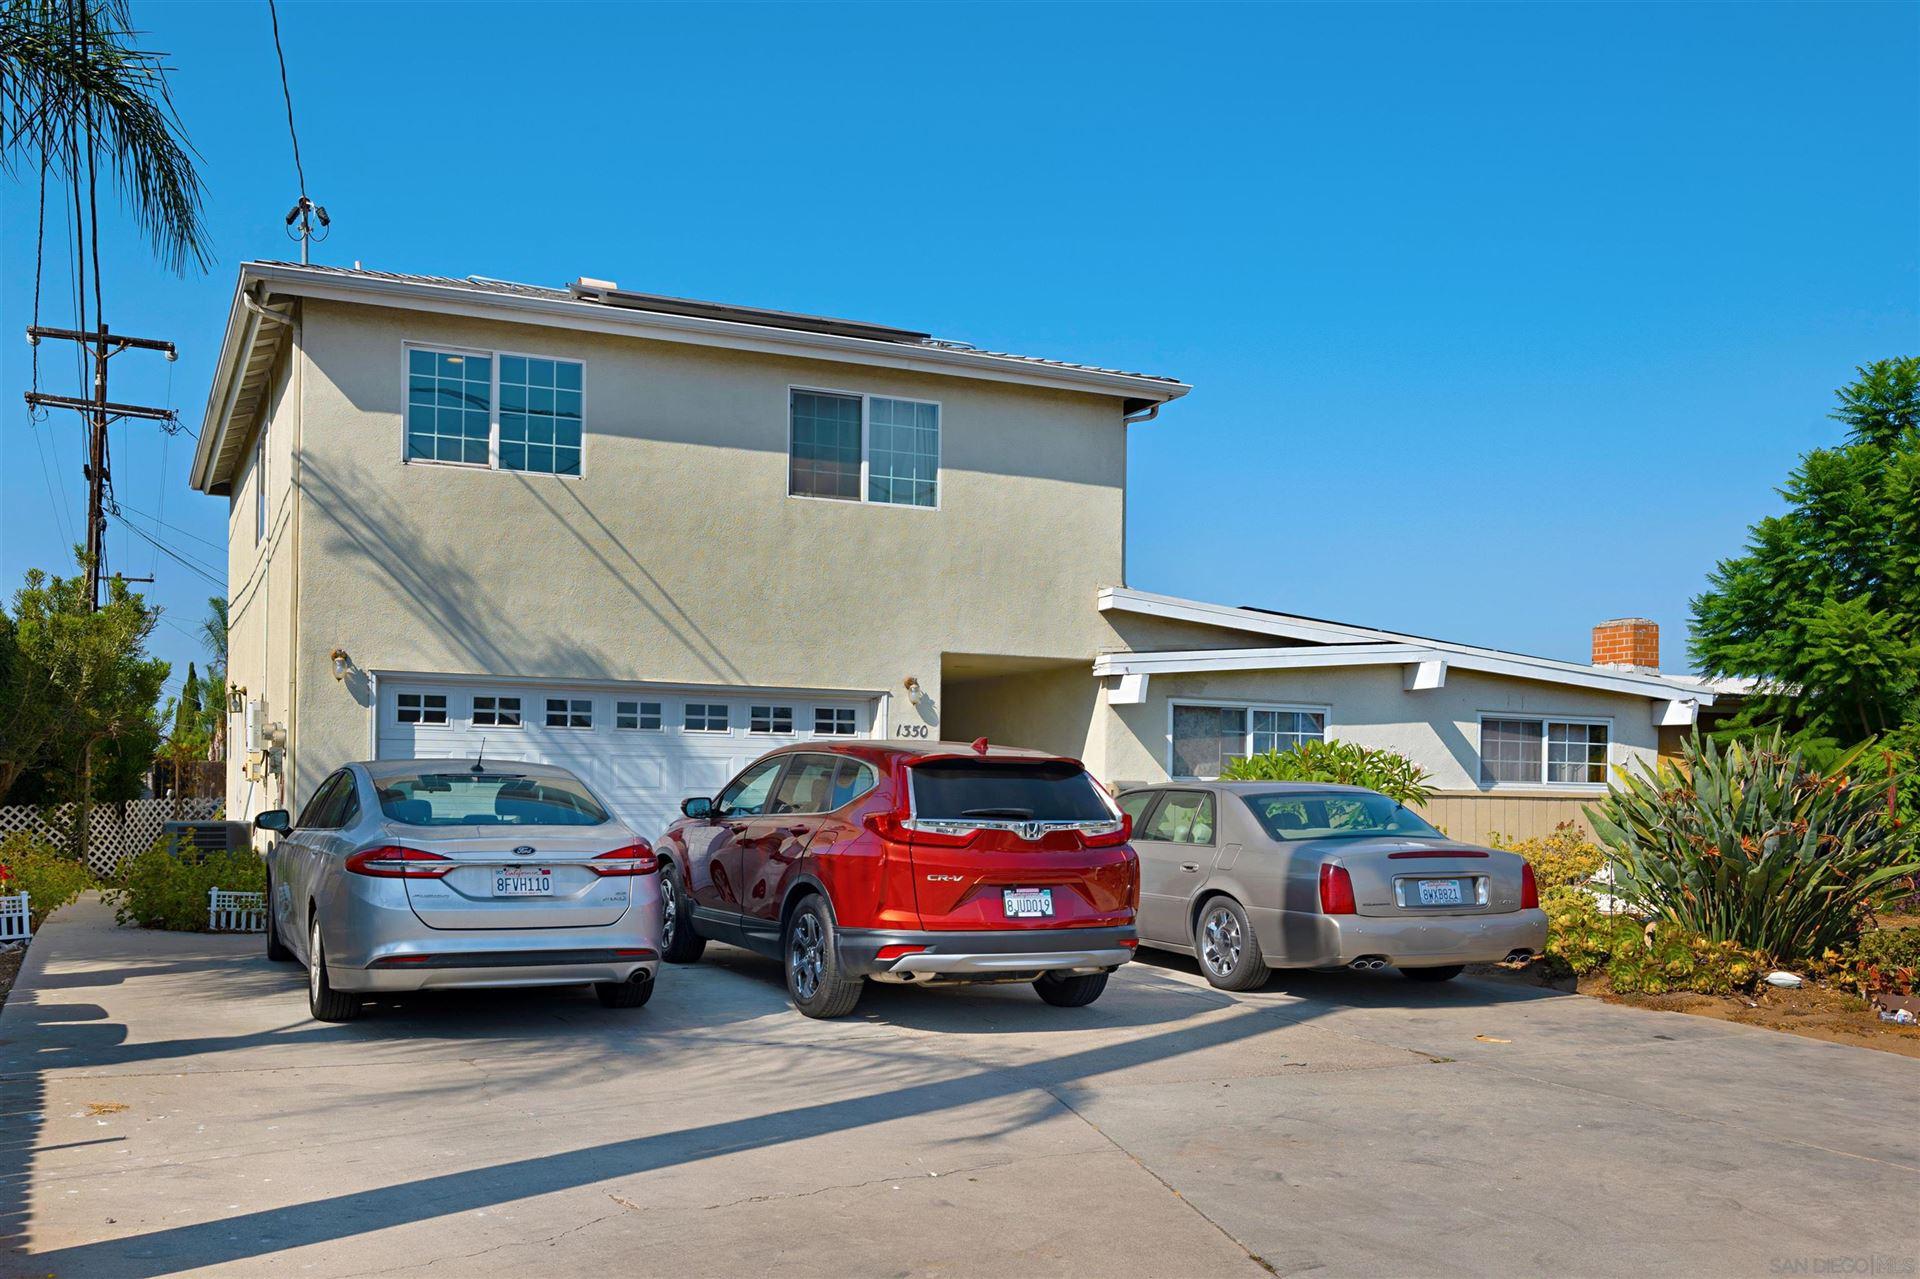 Photo of 1350 E Lexington, El Cajon, CA 92019 (MLS # 210025874)